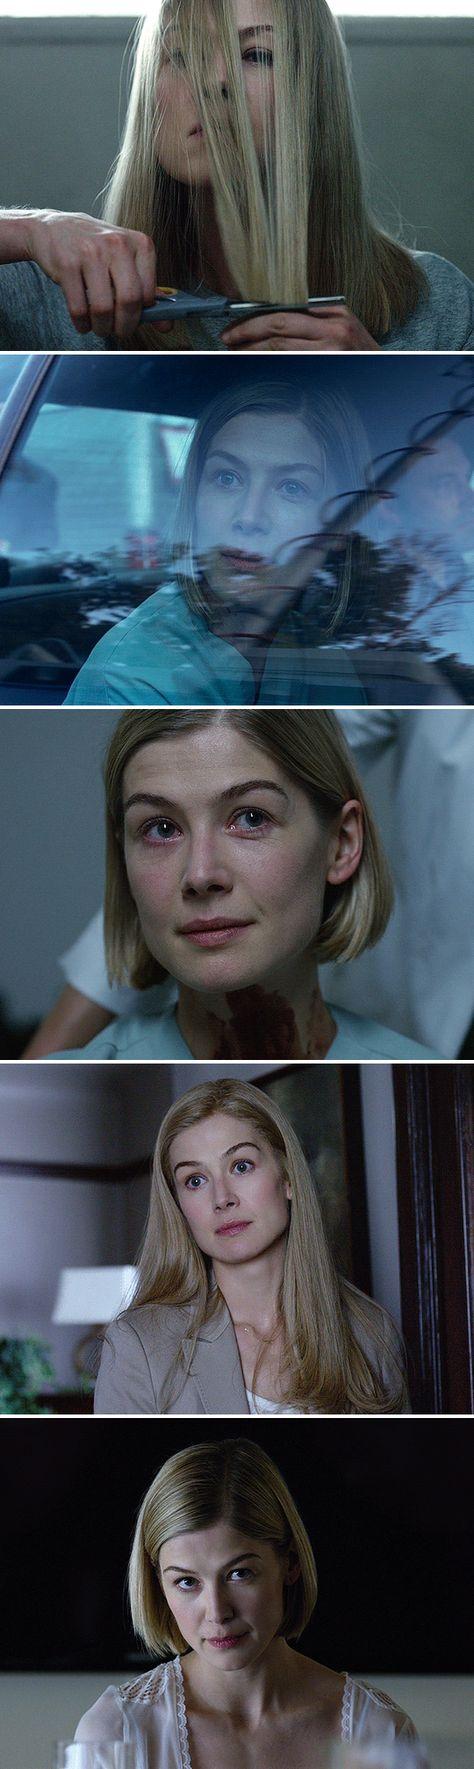 Rosamund Pike as Amy Dunne Gone Girl (2014) dir. David Fincher